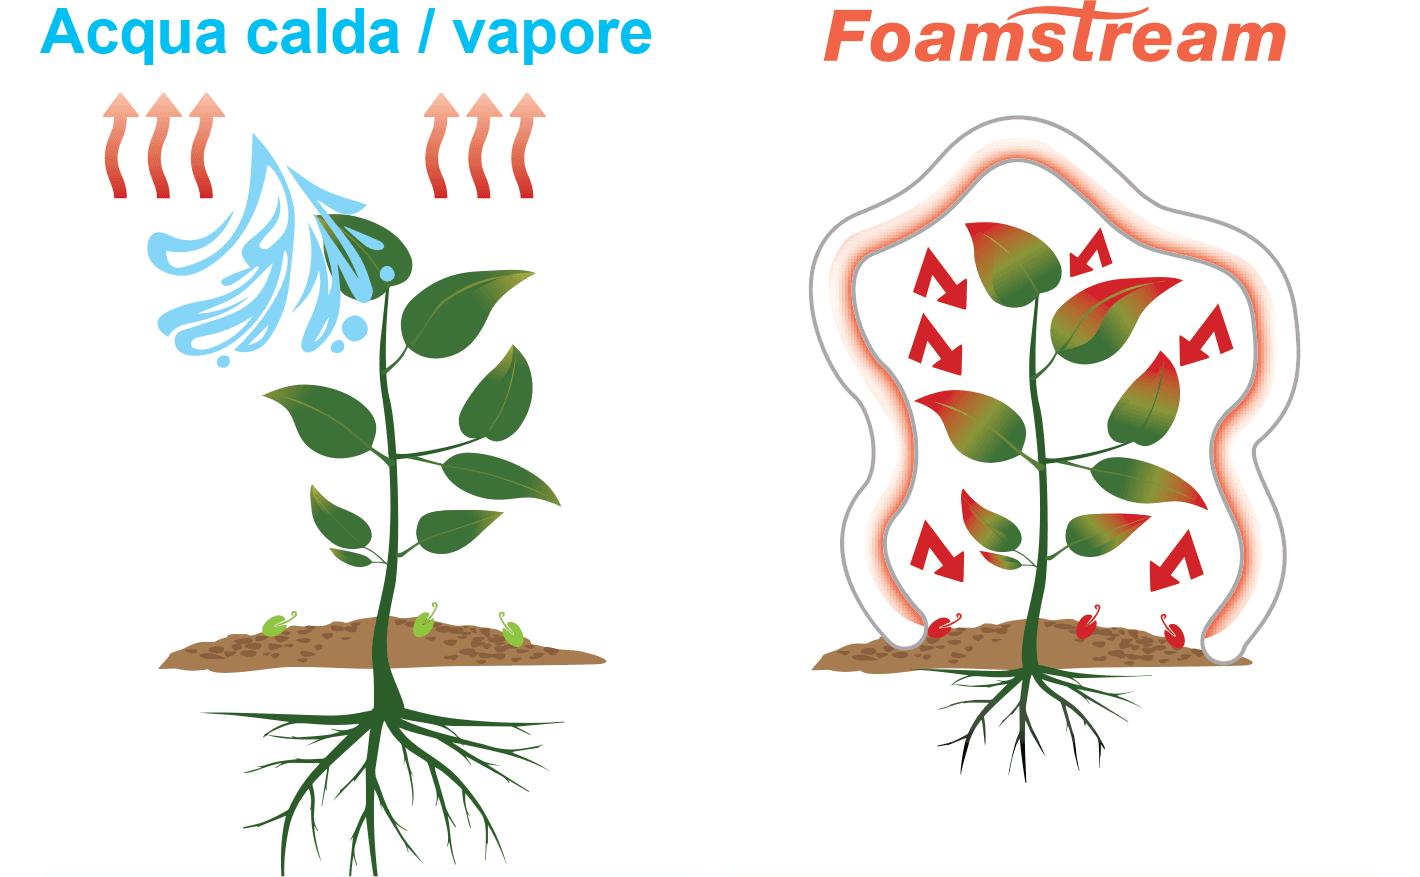 Foamstream